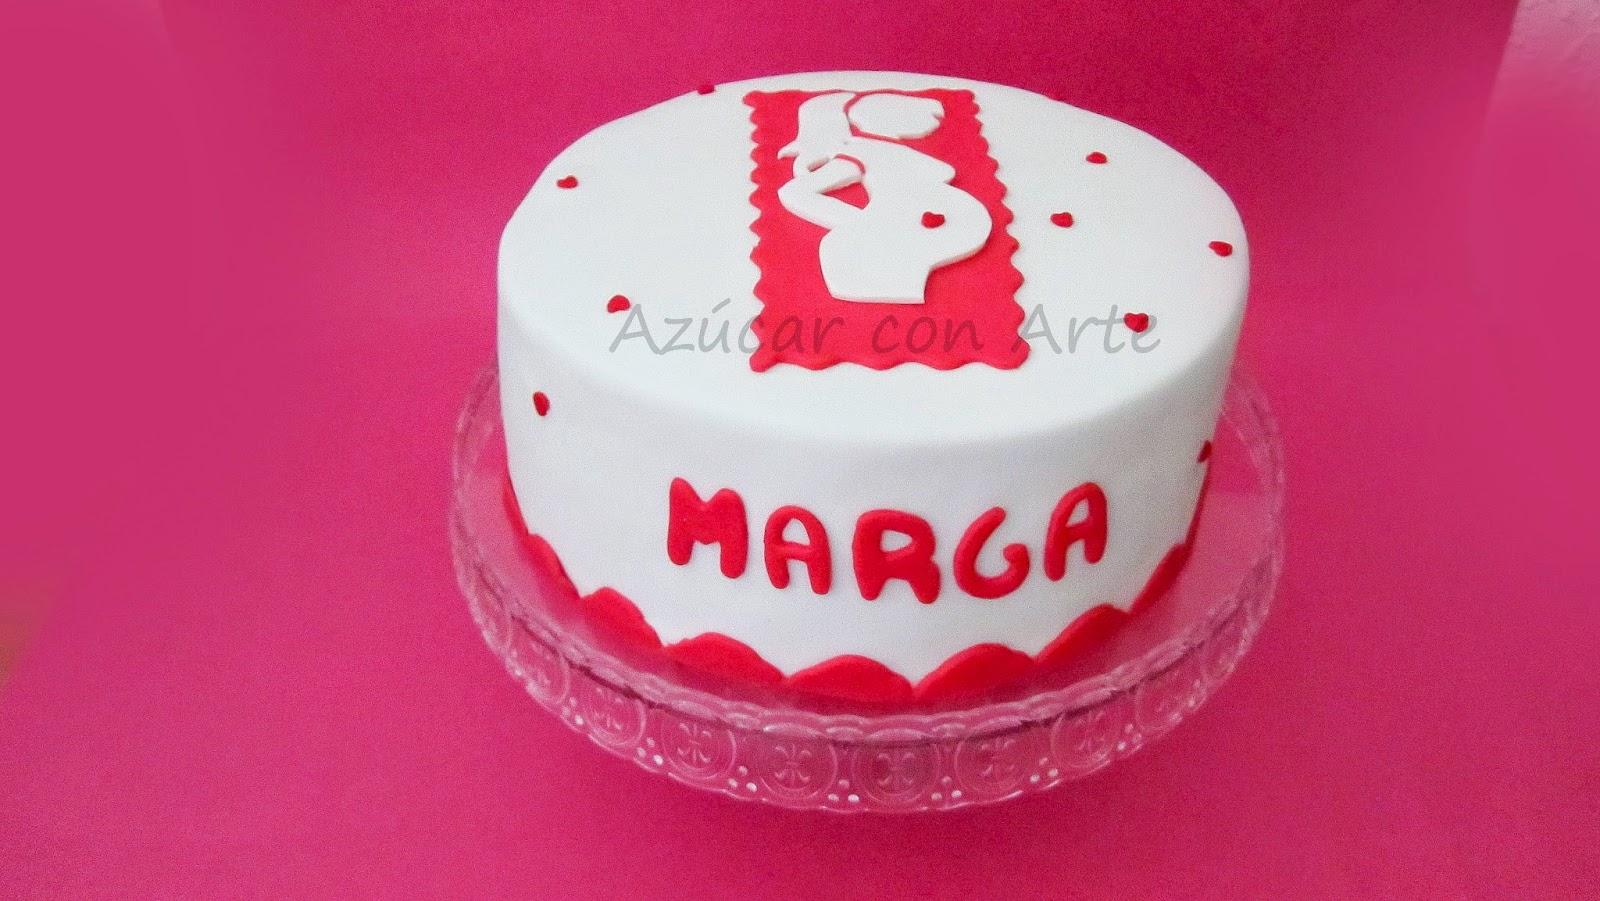 tarta premama,Pregnant woman cake, tarta sin gluten, gluten free cake  azucar con arte